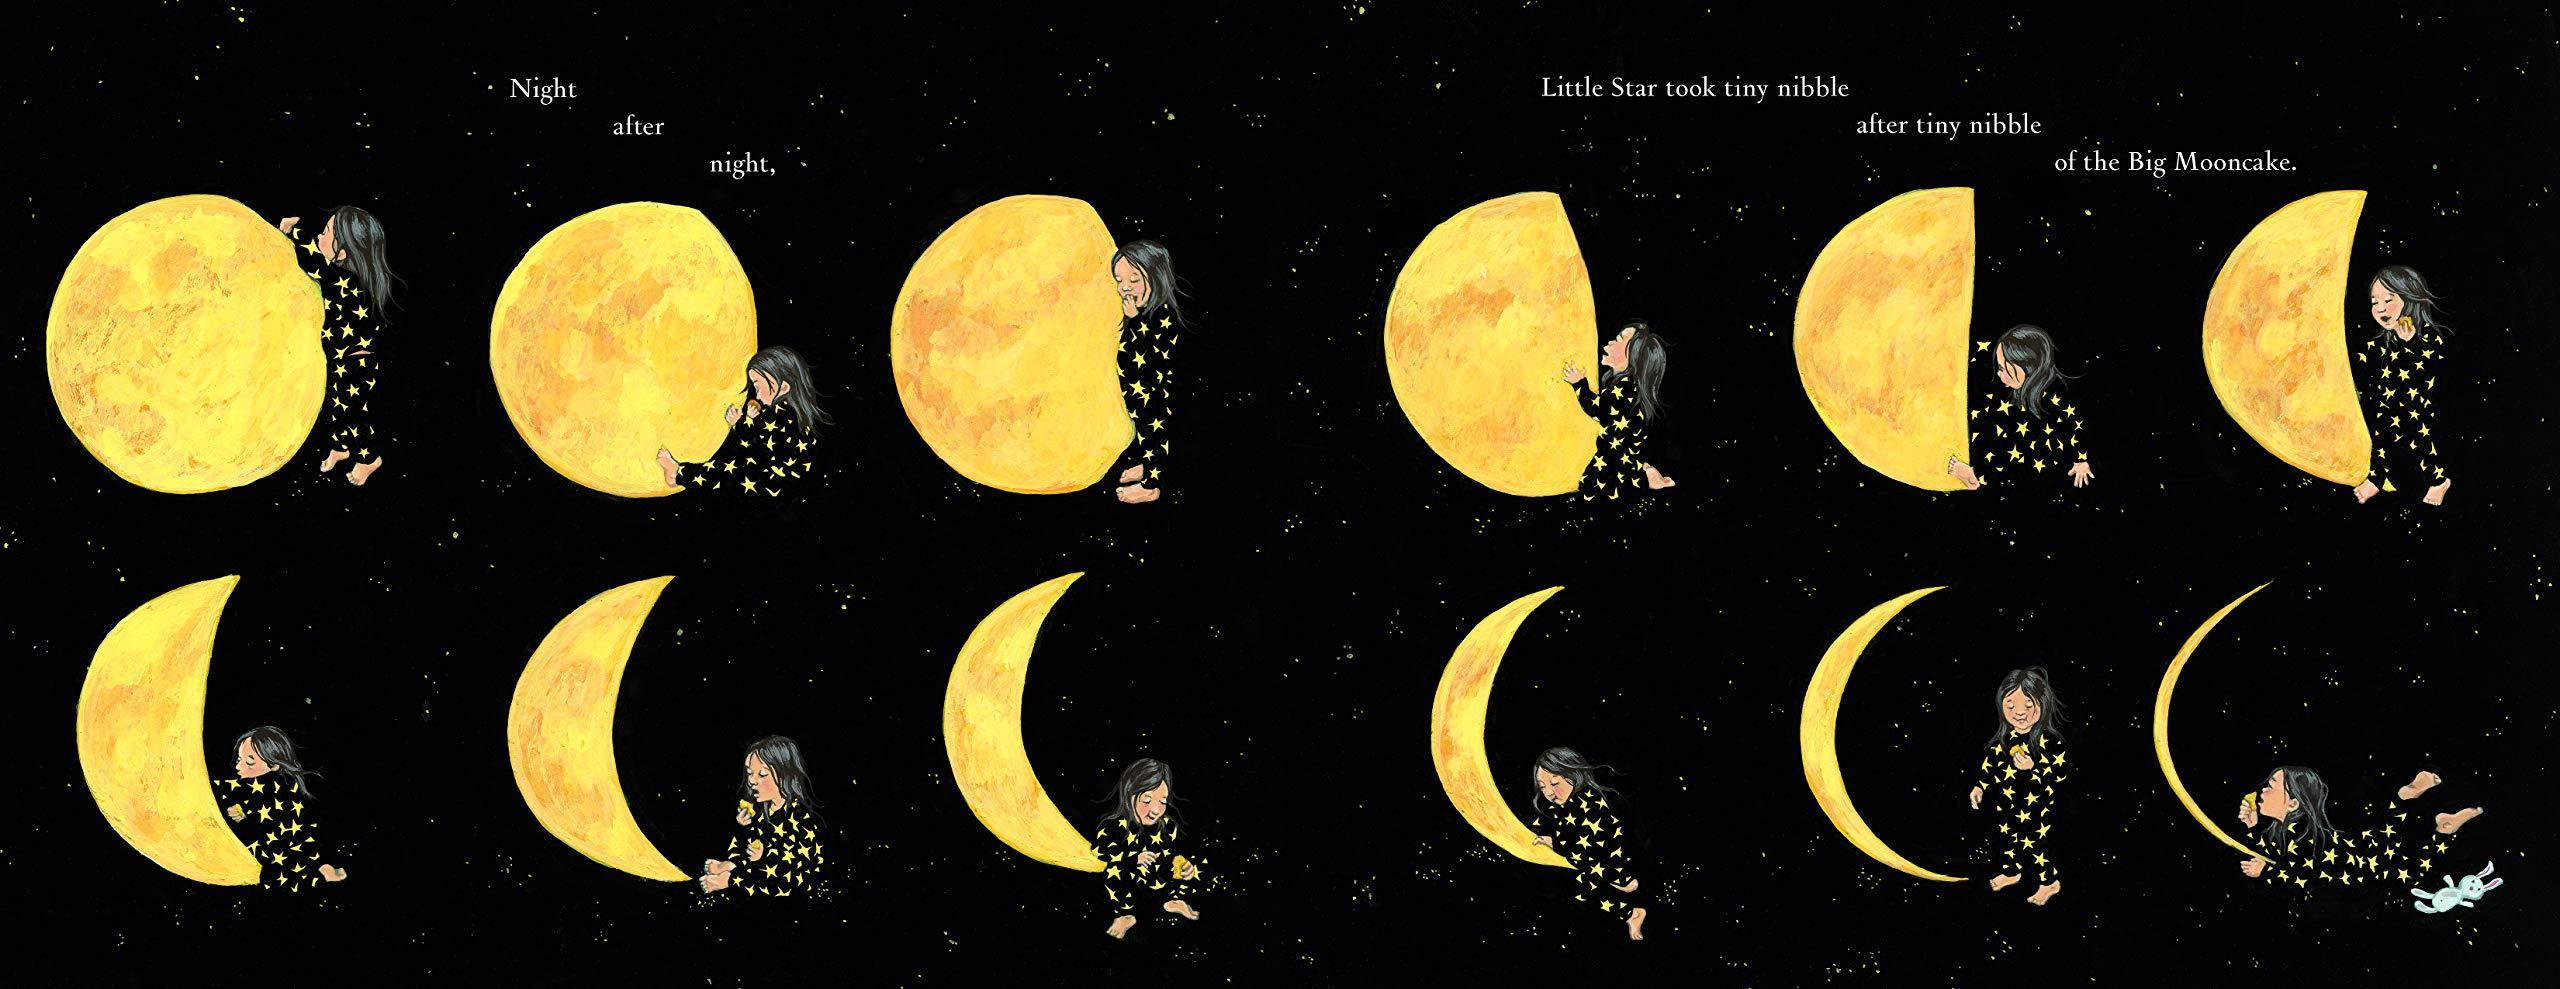 Image result for a big mooncake for little star